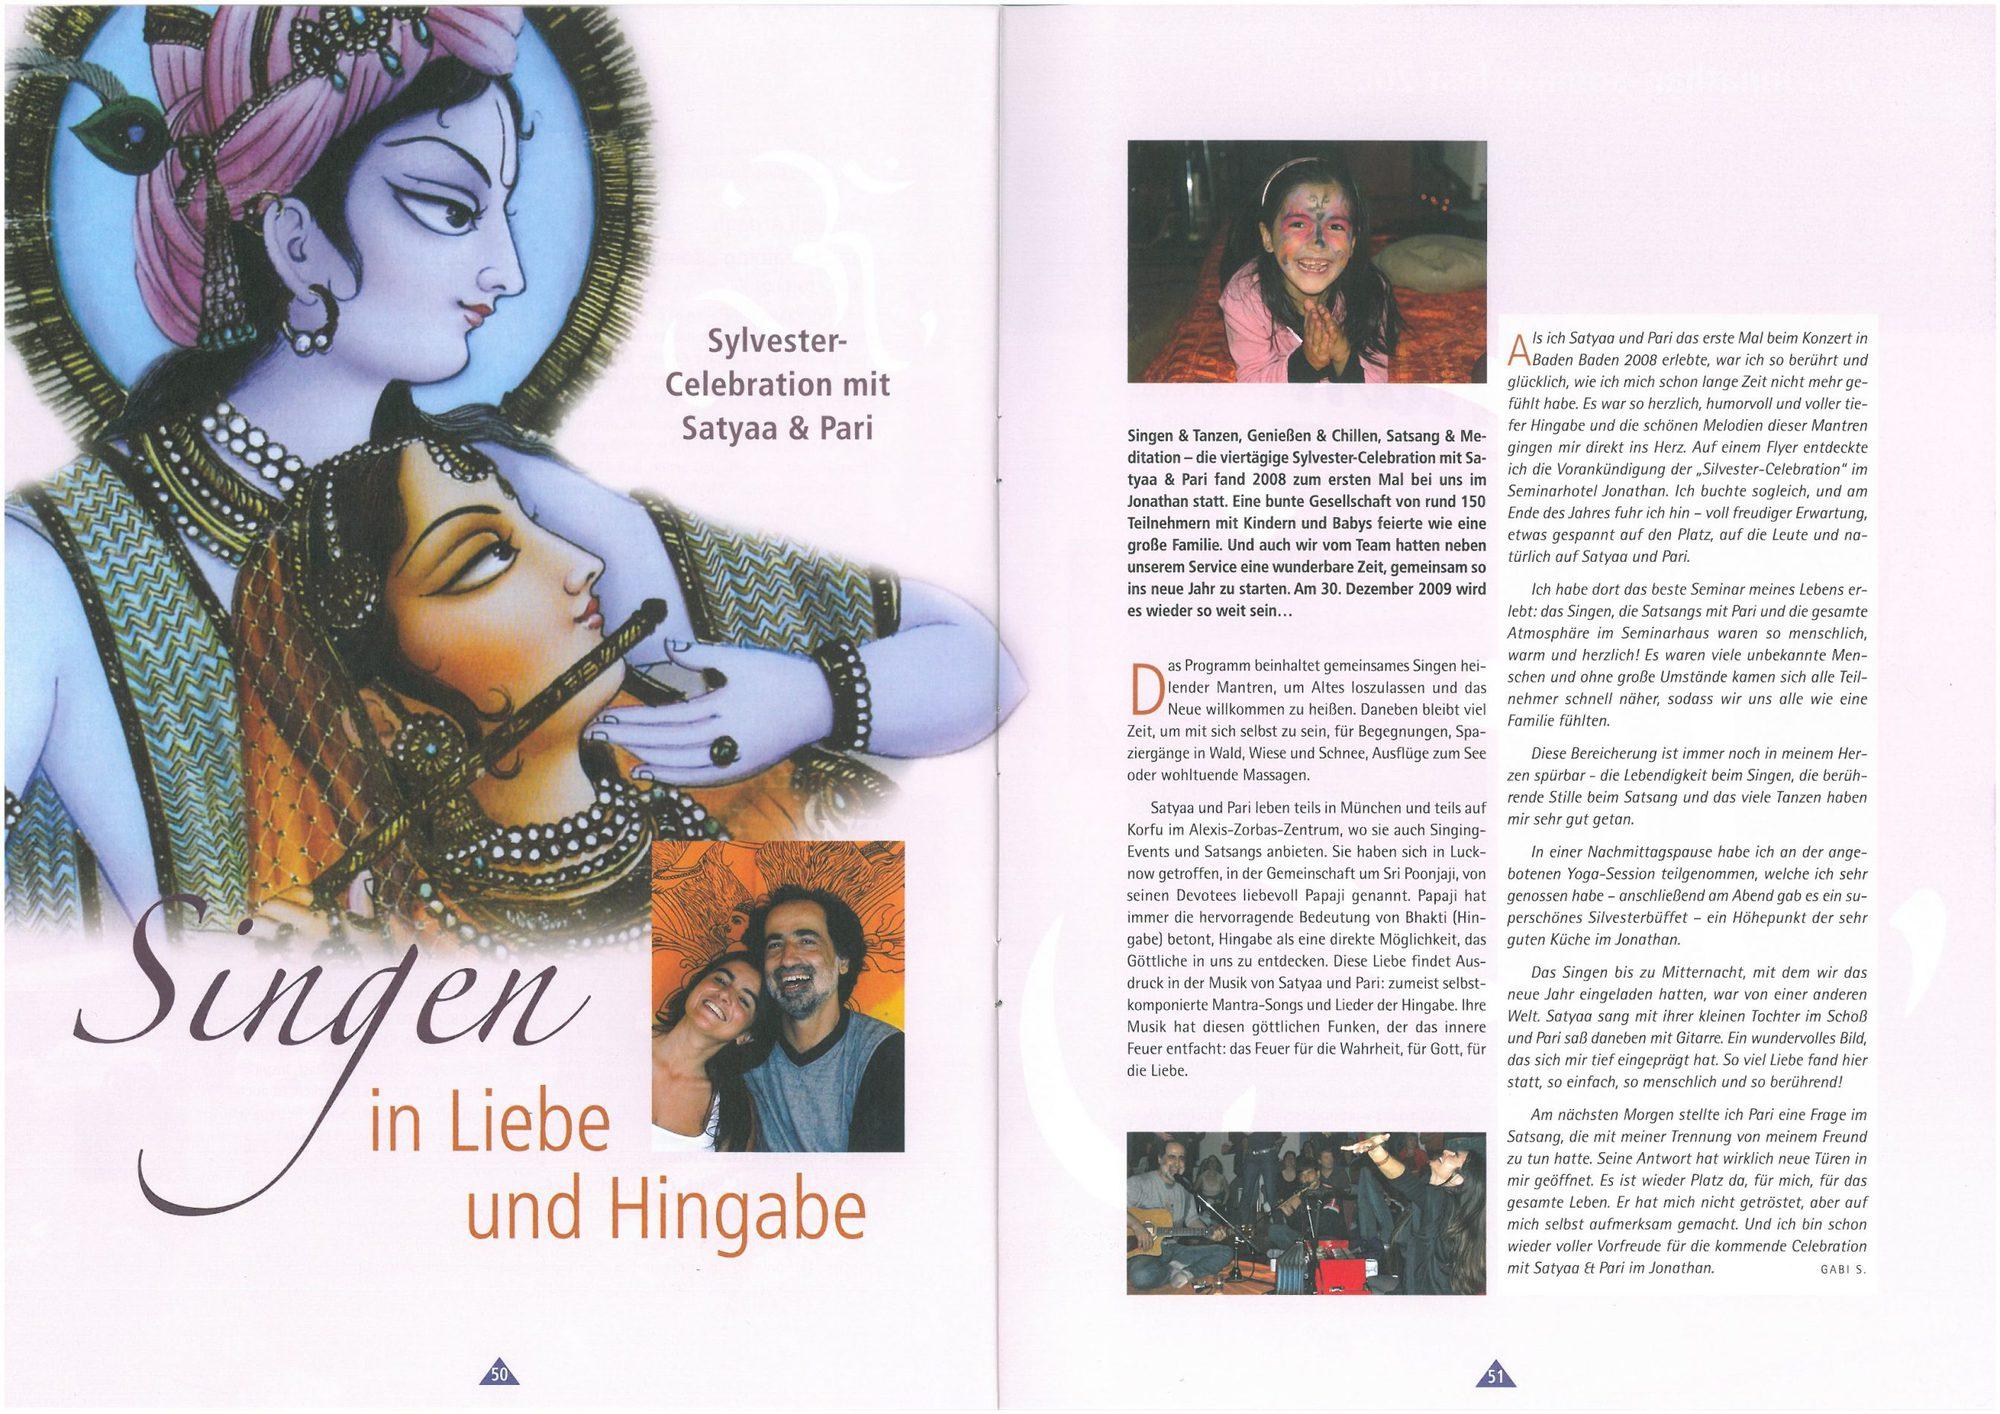 Jonathan Singen In Liebe Und Hingabe Satyaa Pari